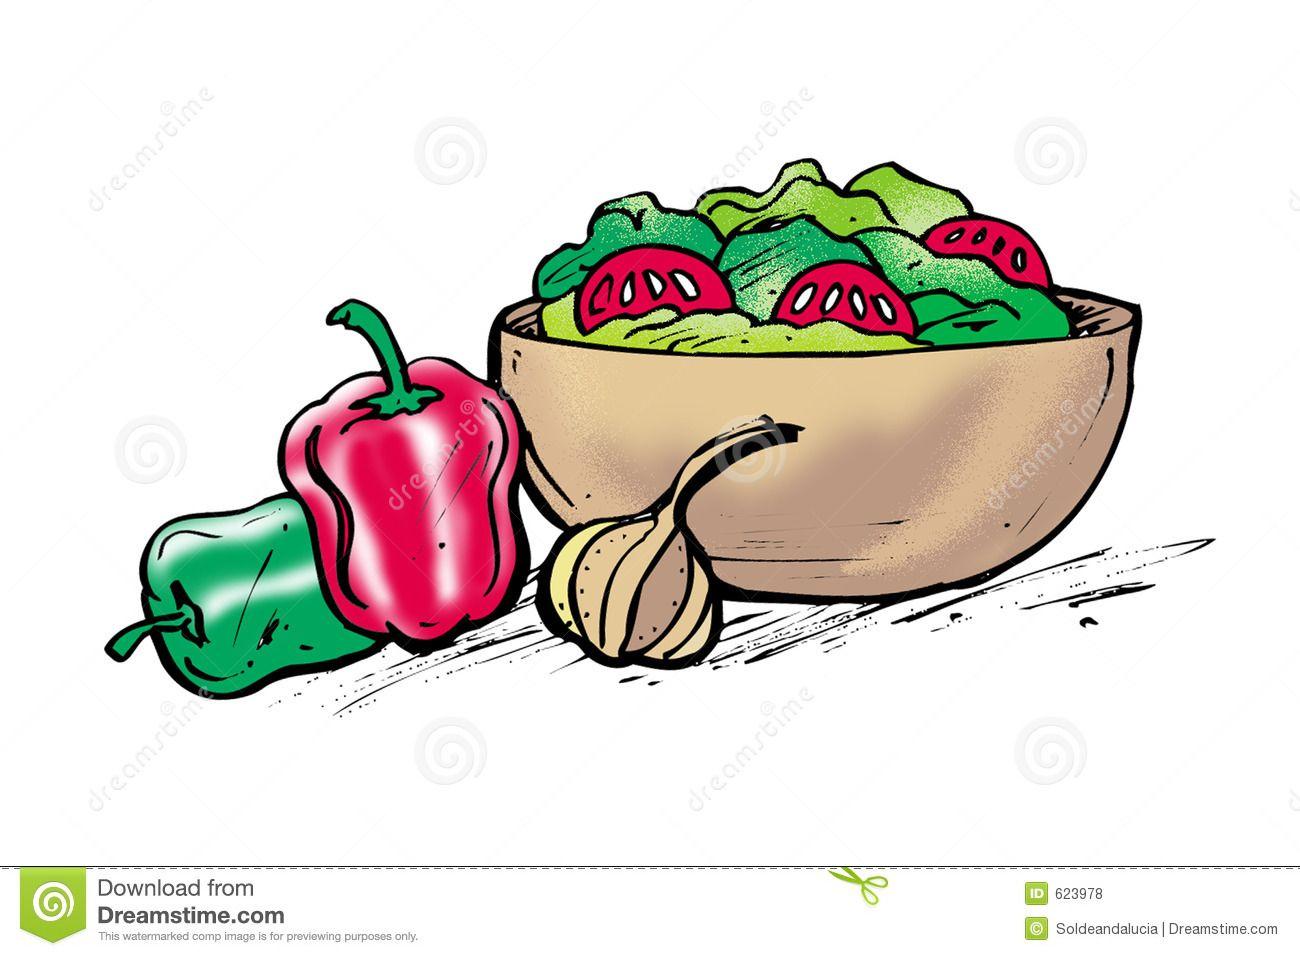 1300x956 Garden Salad Clip Art Salad Clipart Salad Bowl 623978.jpg